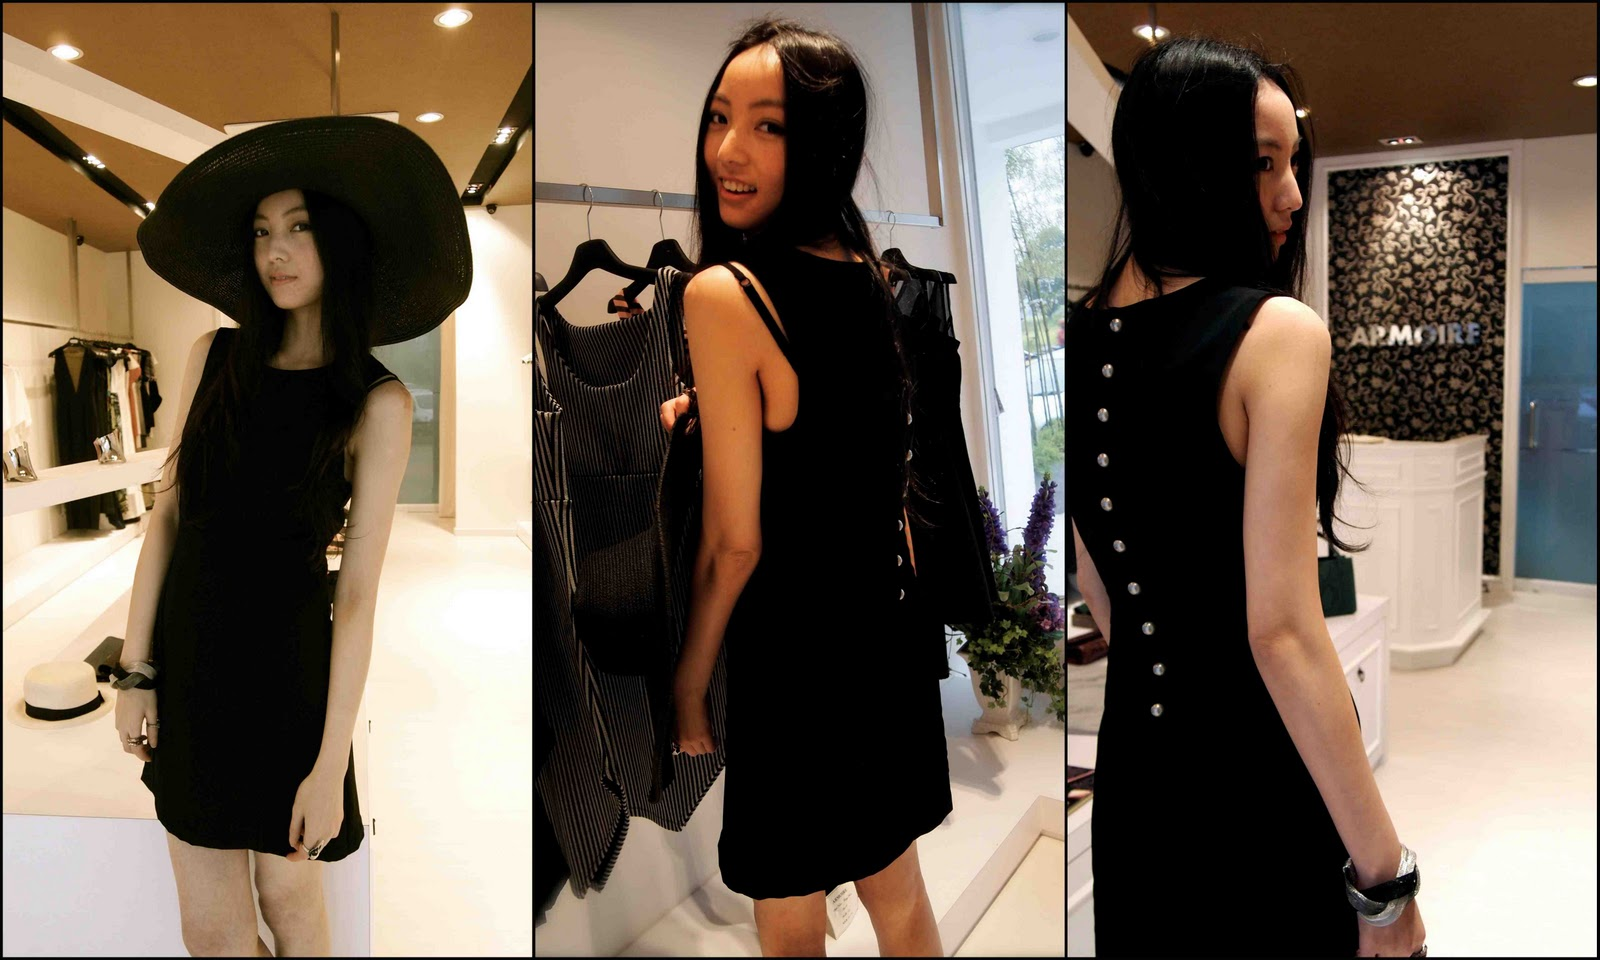 Erika Tan in Armoire's rock n' roll dress